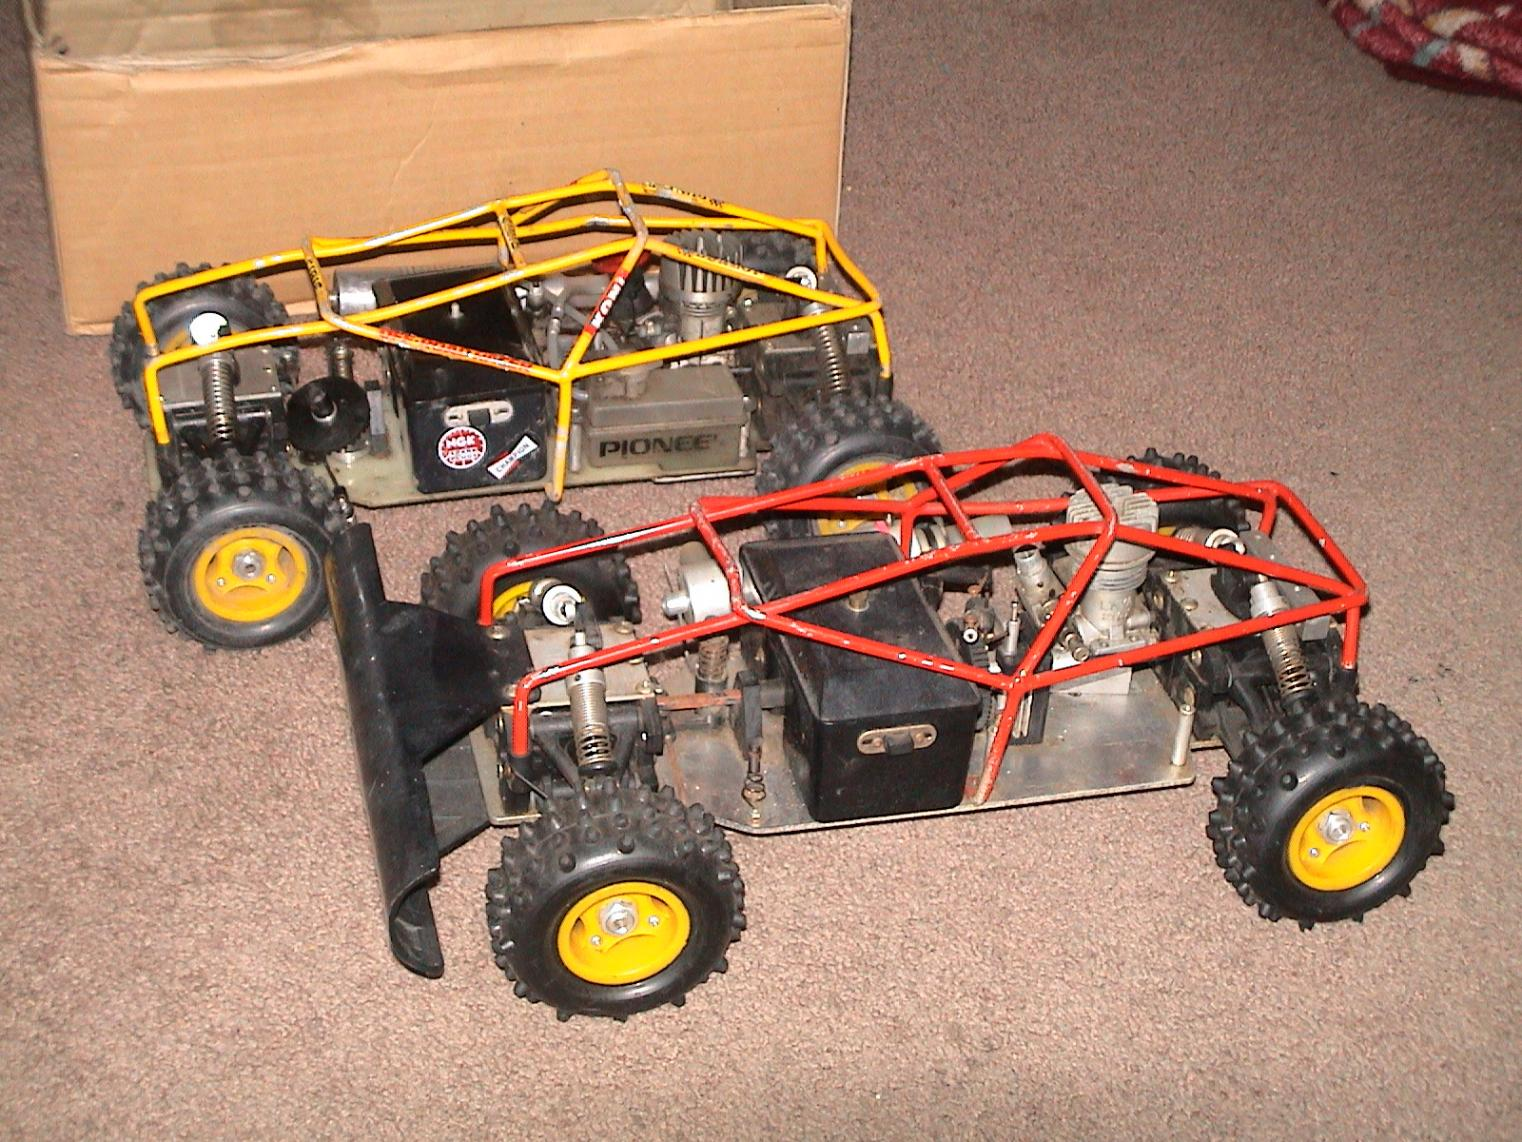 Hobby Rc Toys 21